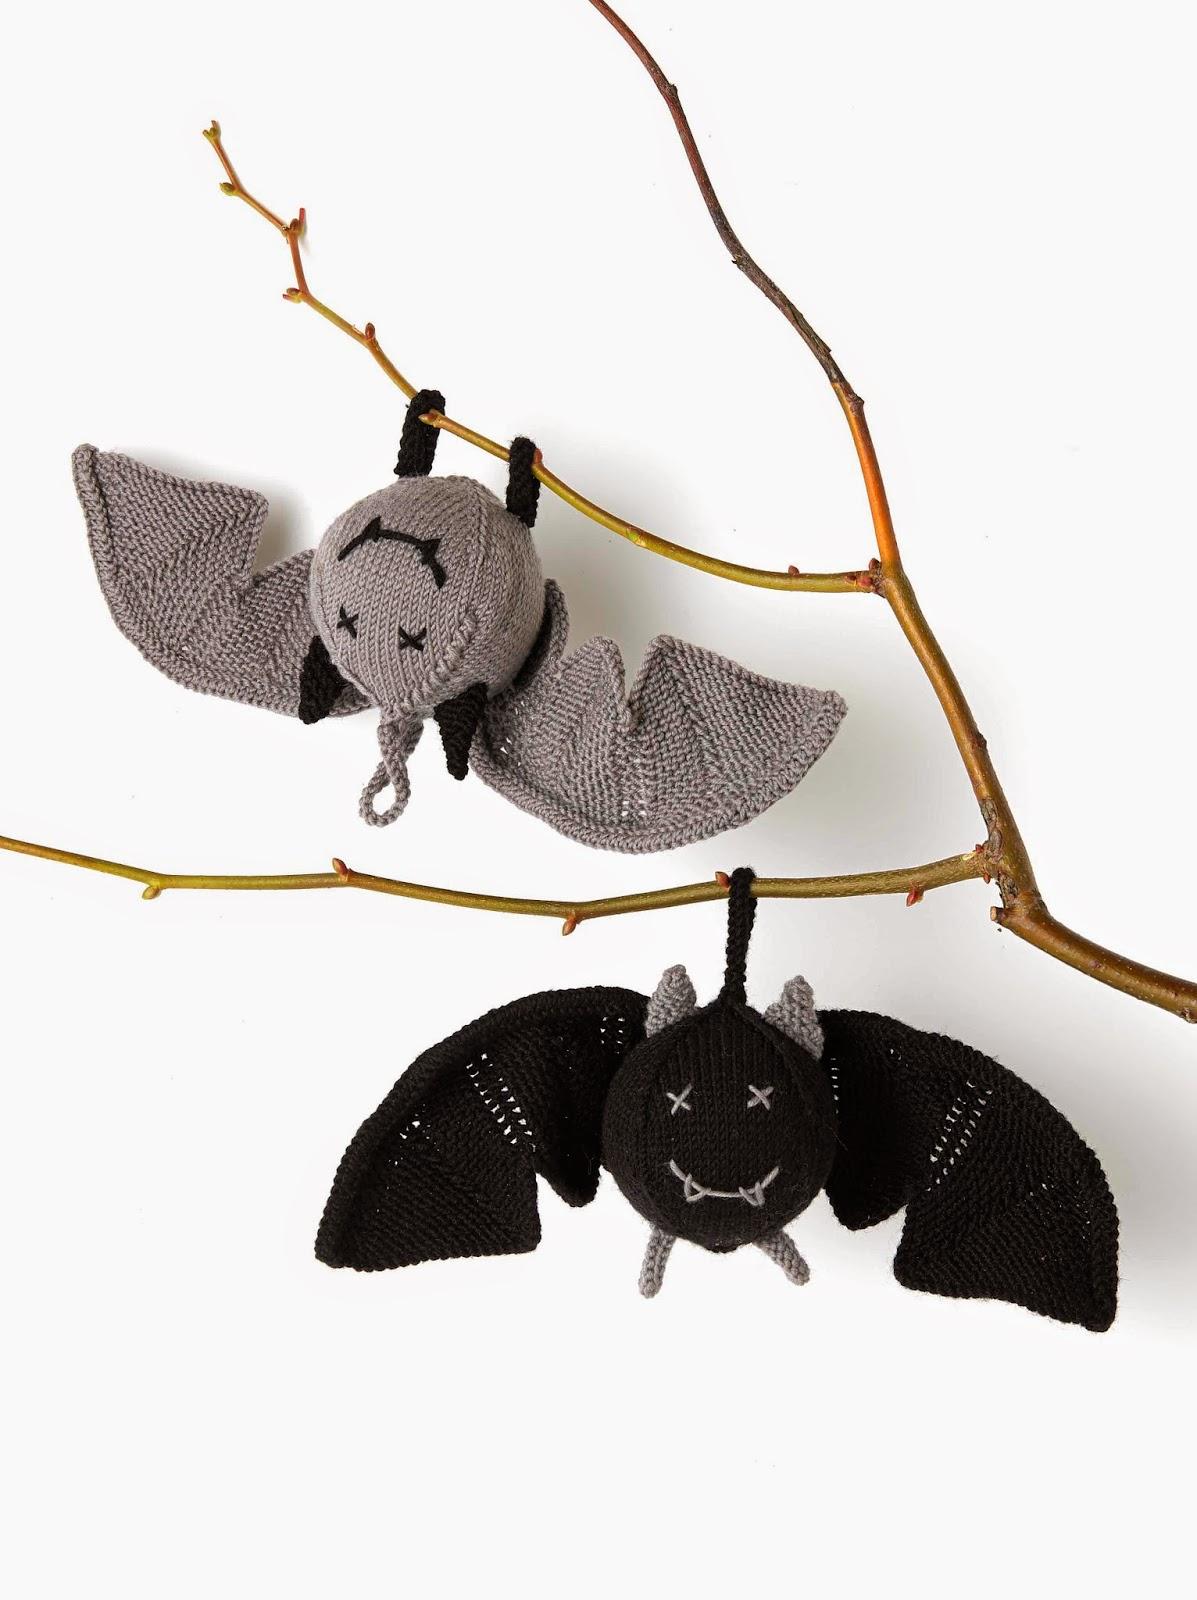 http://millamia.com/pat_size.php?name=Bat Toy&sort=&type=